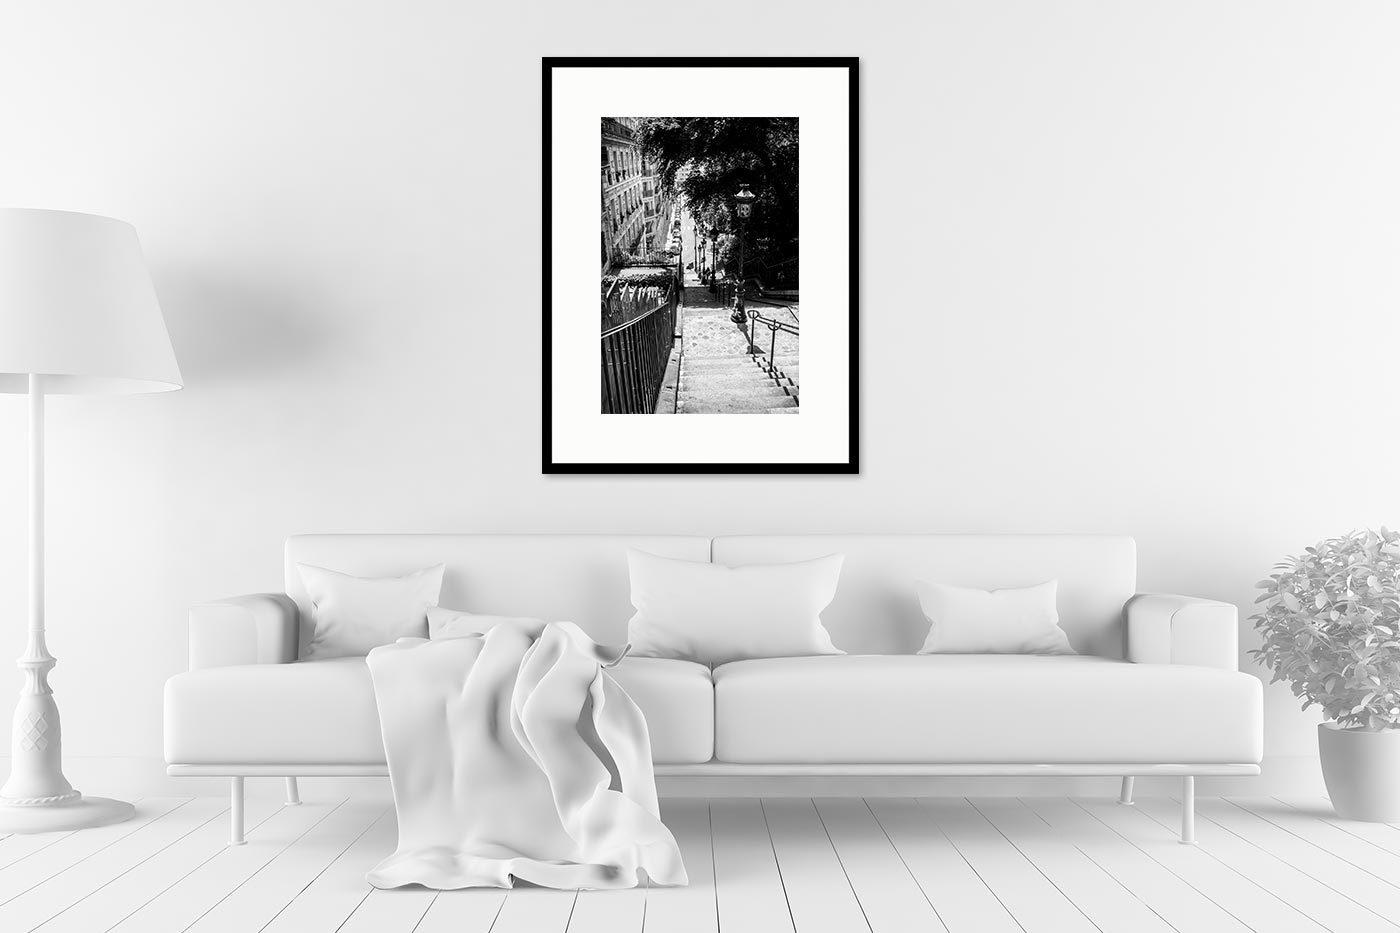 Cadre galerie 60x80 Montmartre